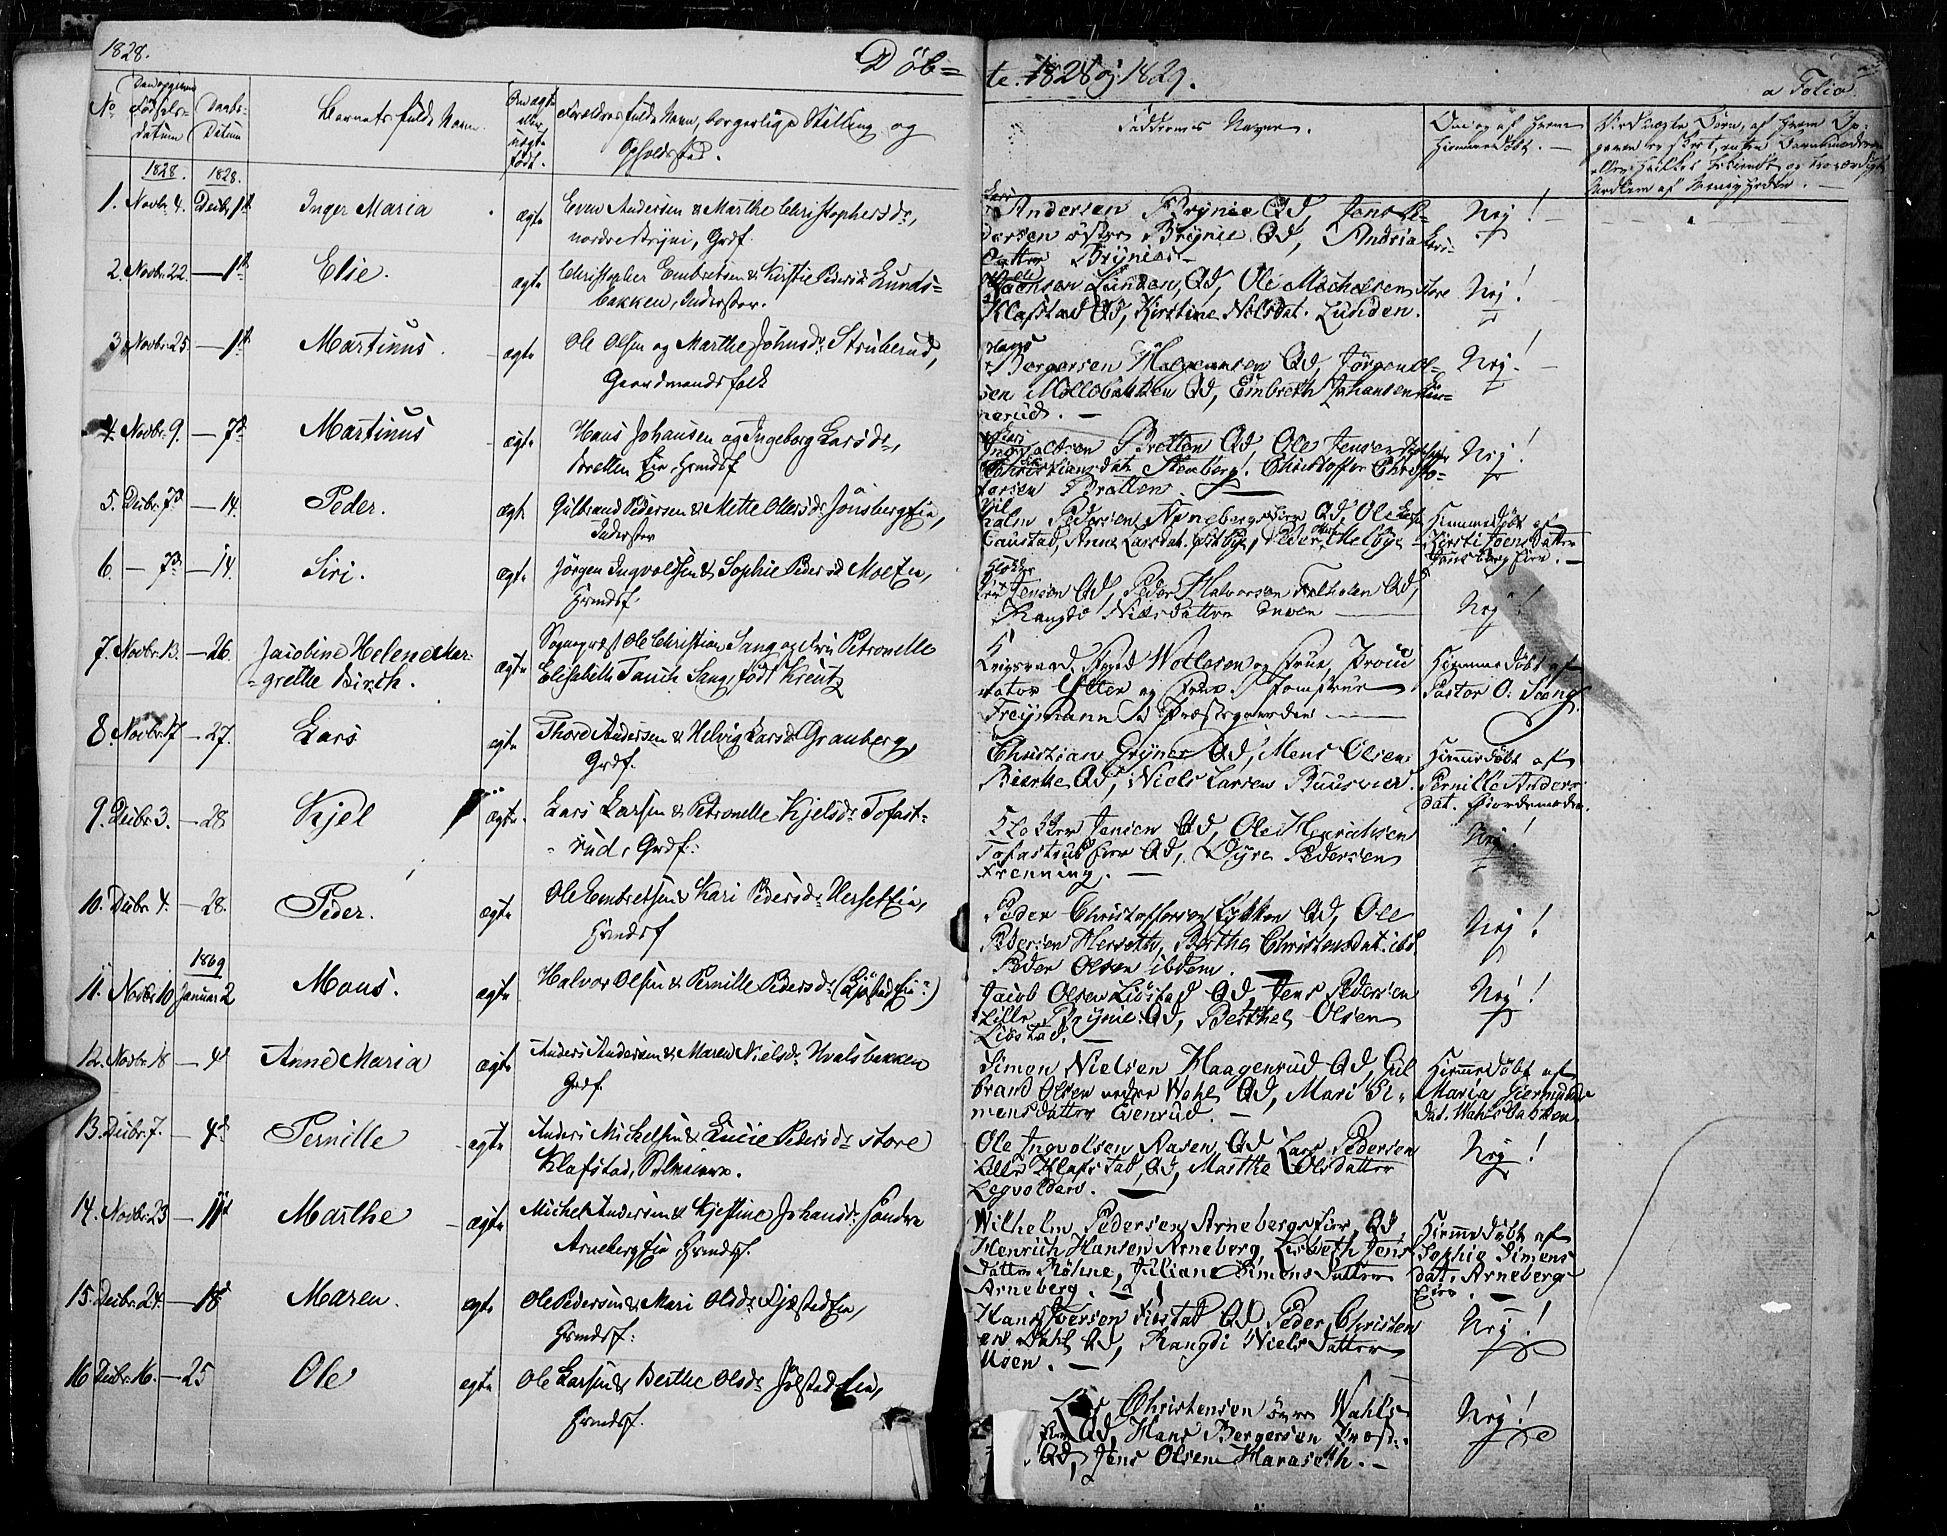 SAH, Romedal prestekontor, K/L0003: Ministerialbok nr. 3, 1829-1846, s. 2